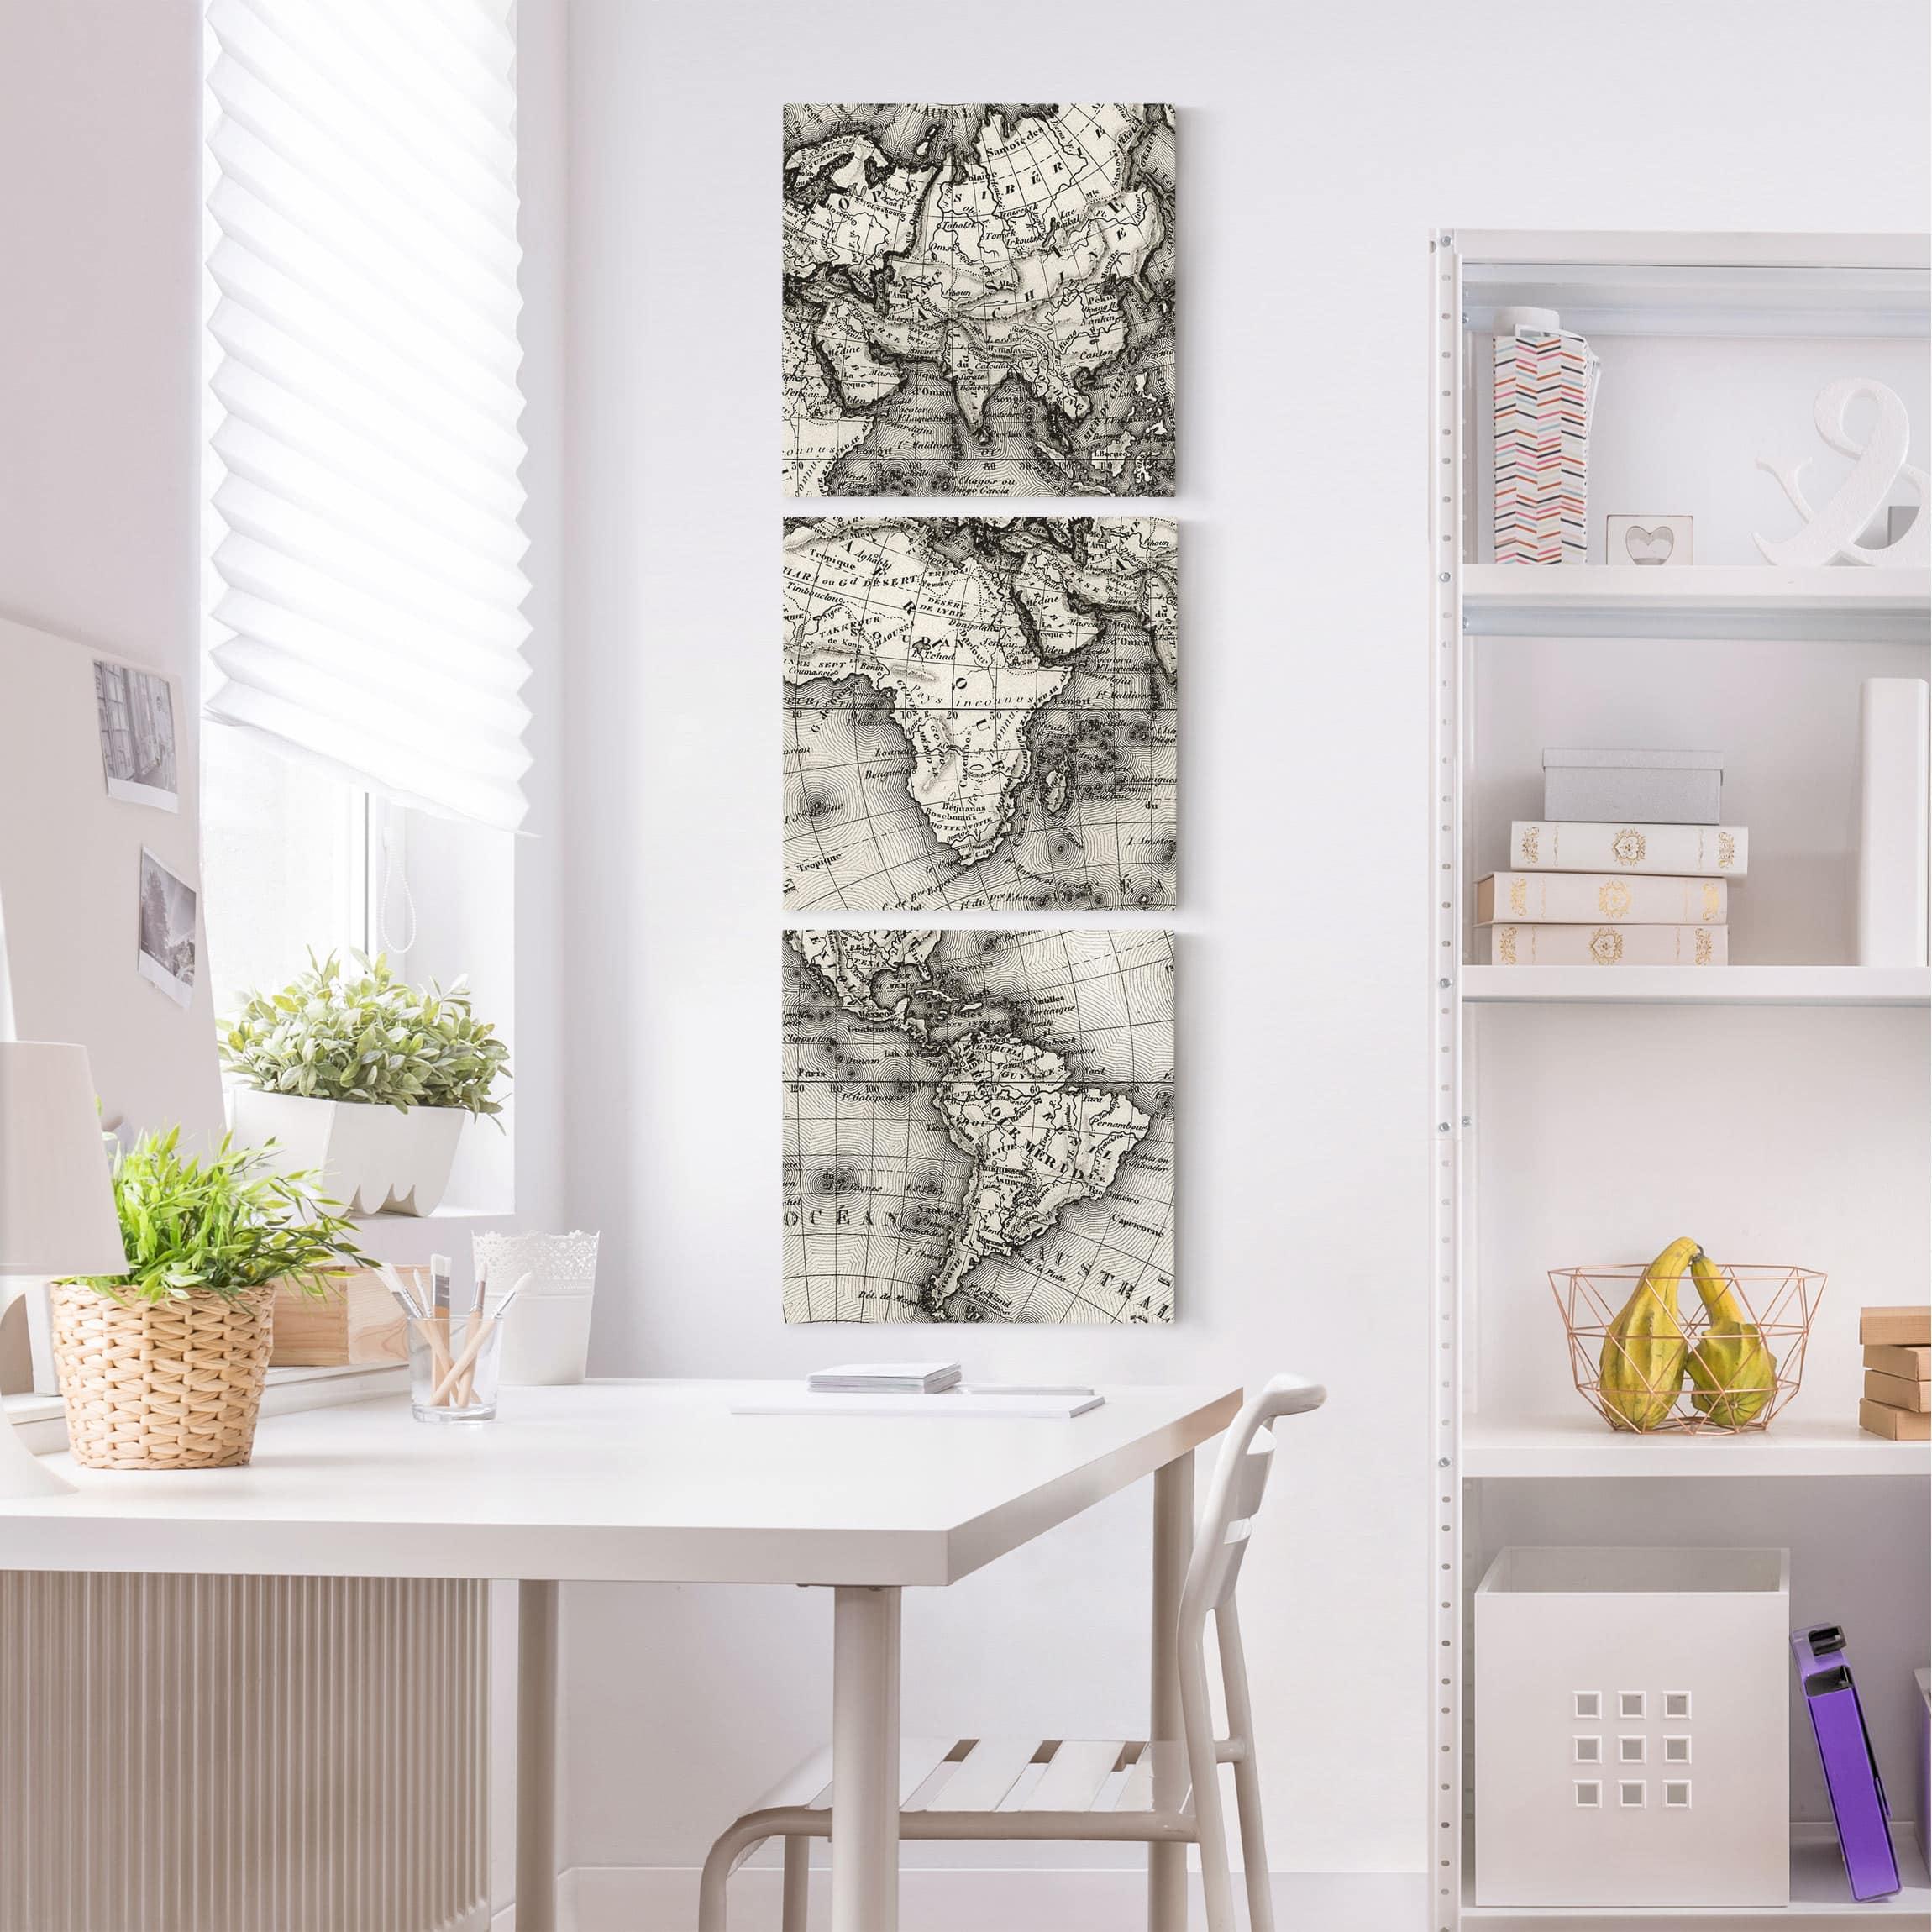 leinwandbild 3 teilig alte weltkarte details quadrate 1 1. Black Bedroom Furniture Sets. Home Design Ideas